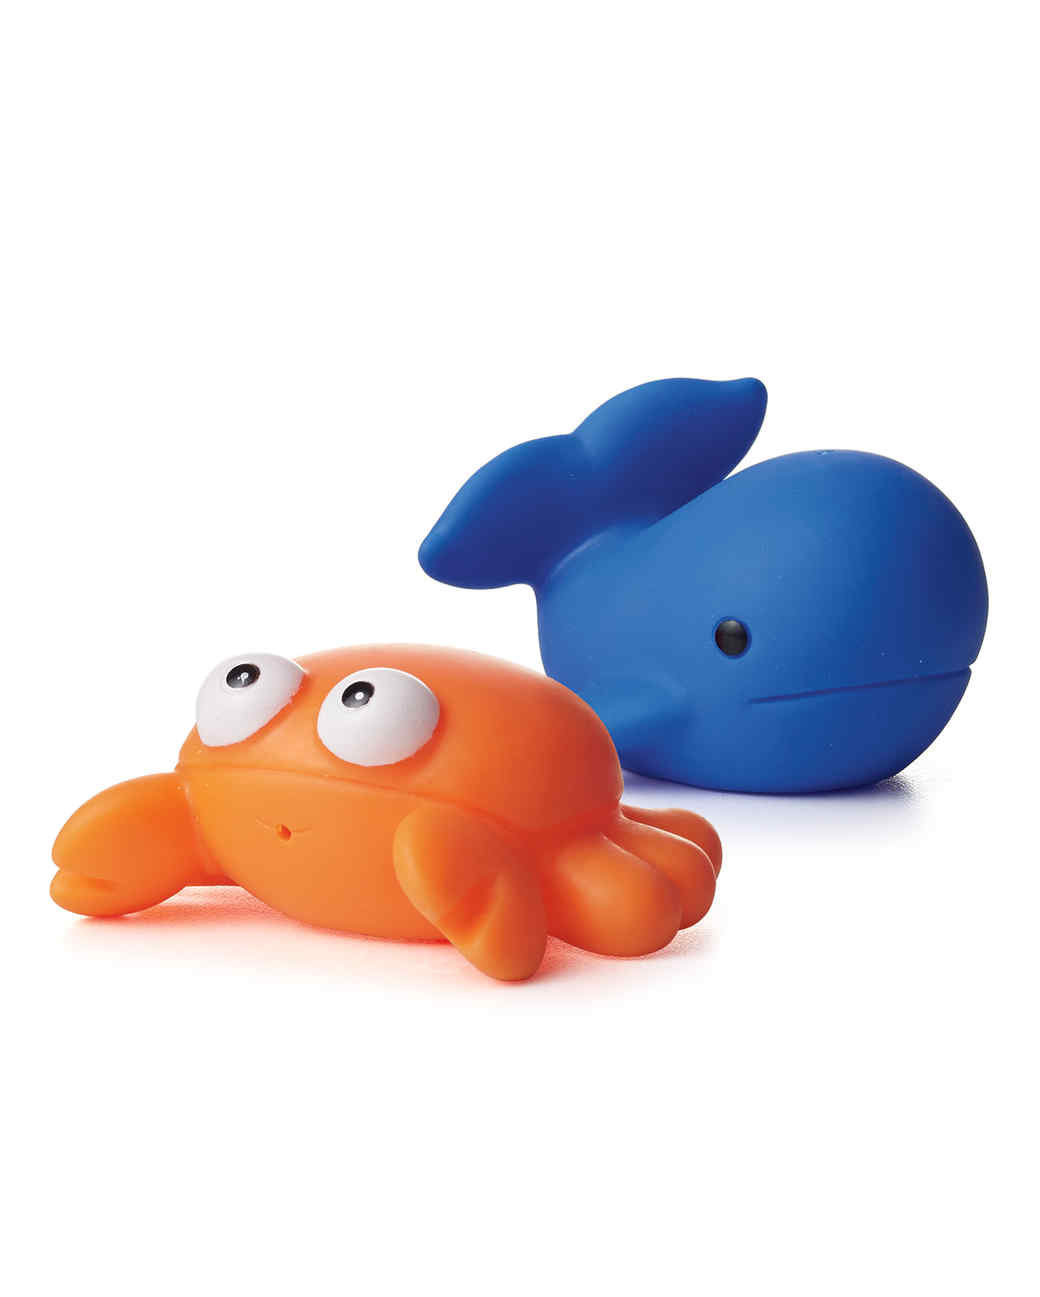 baby-bath-toy-animals-014-d112164-comp.jpg